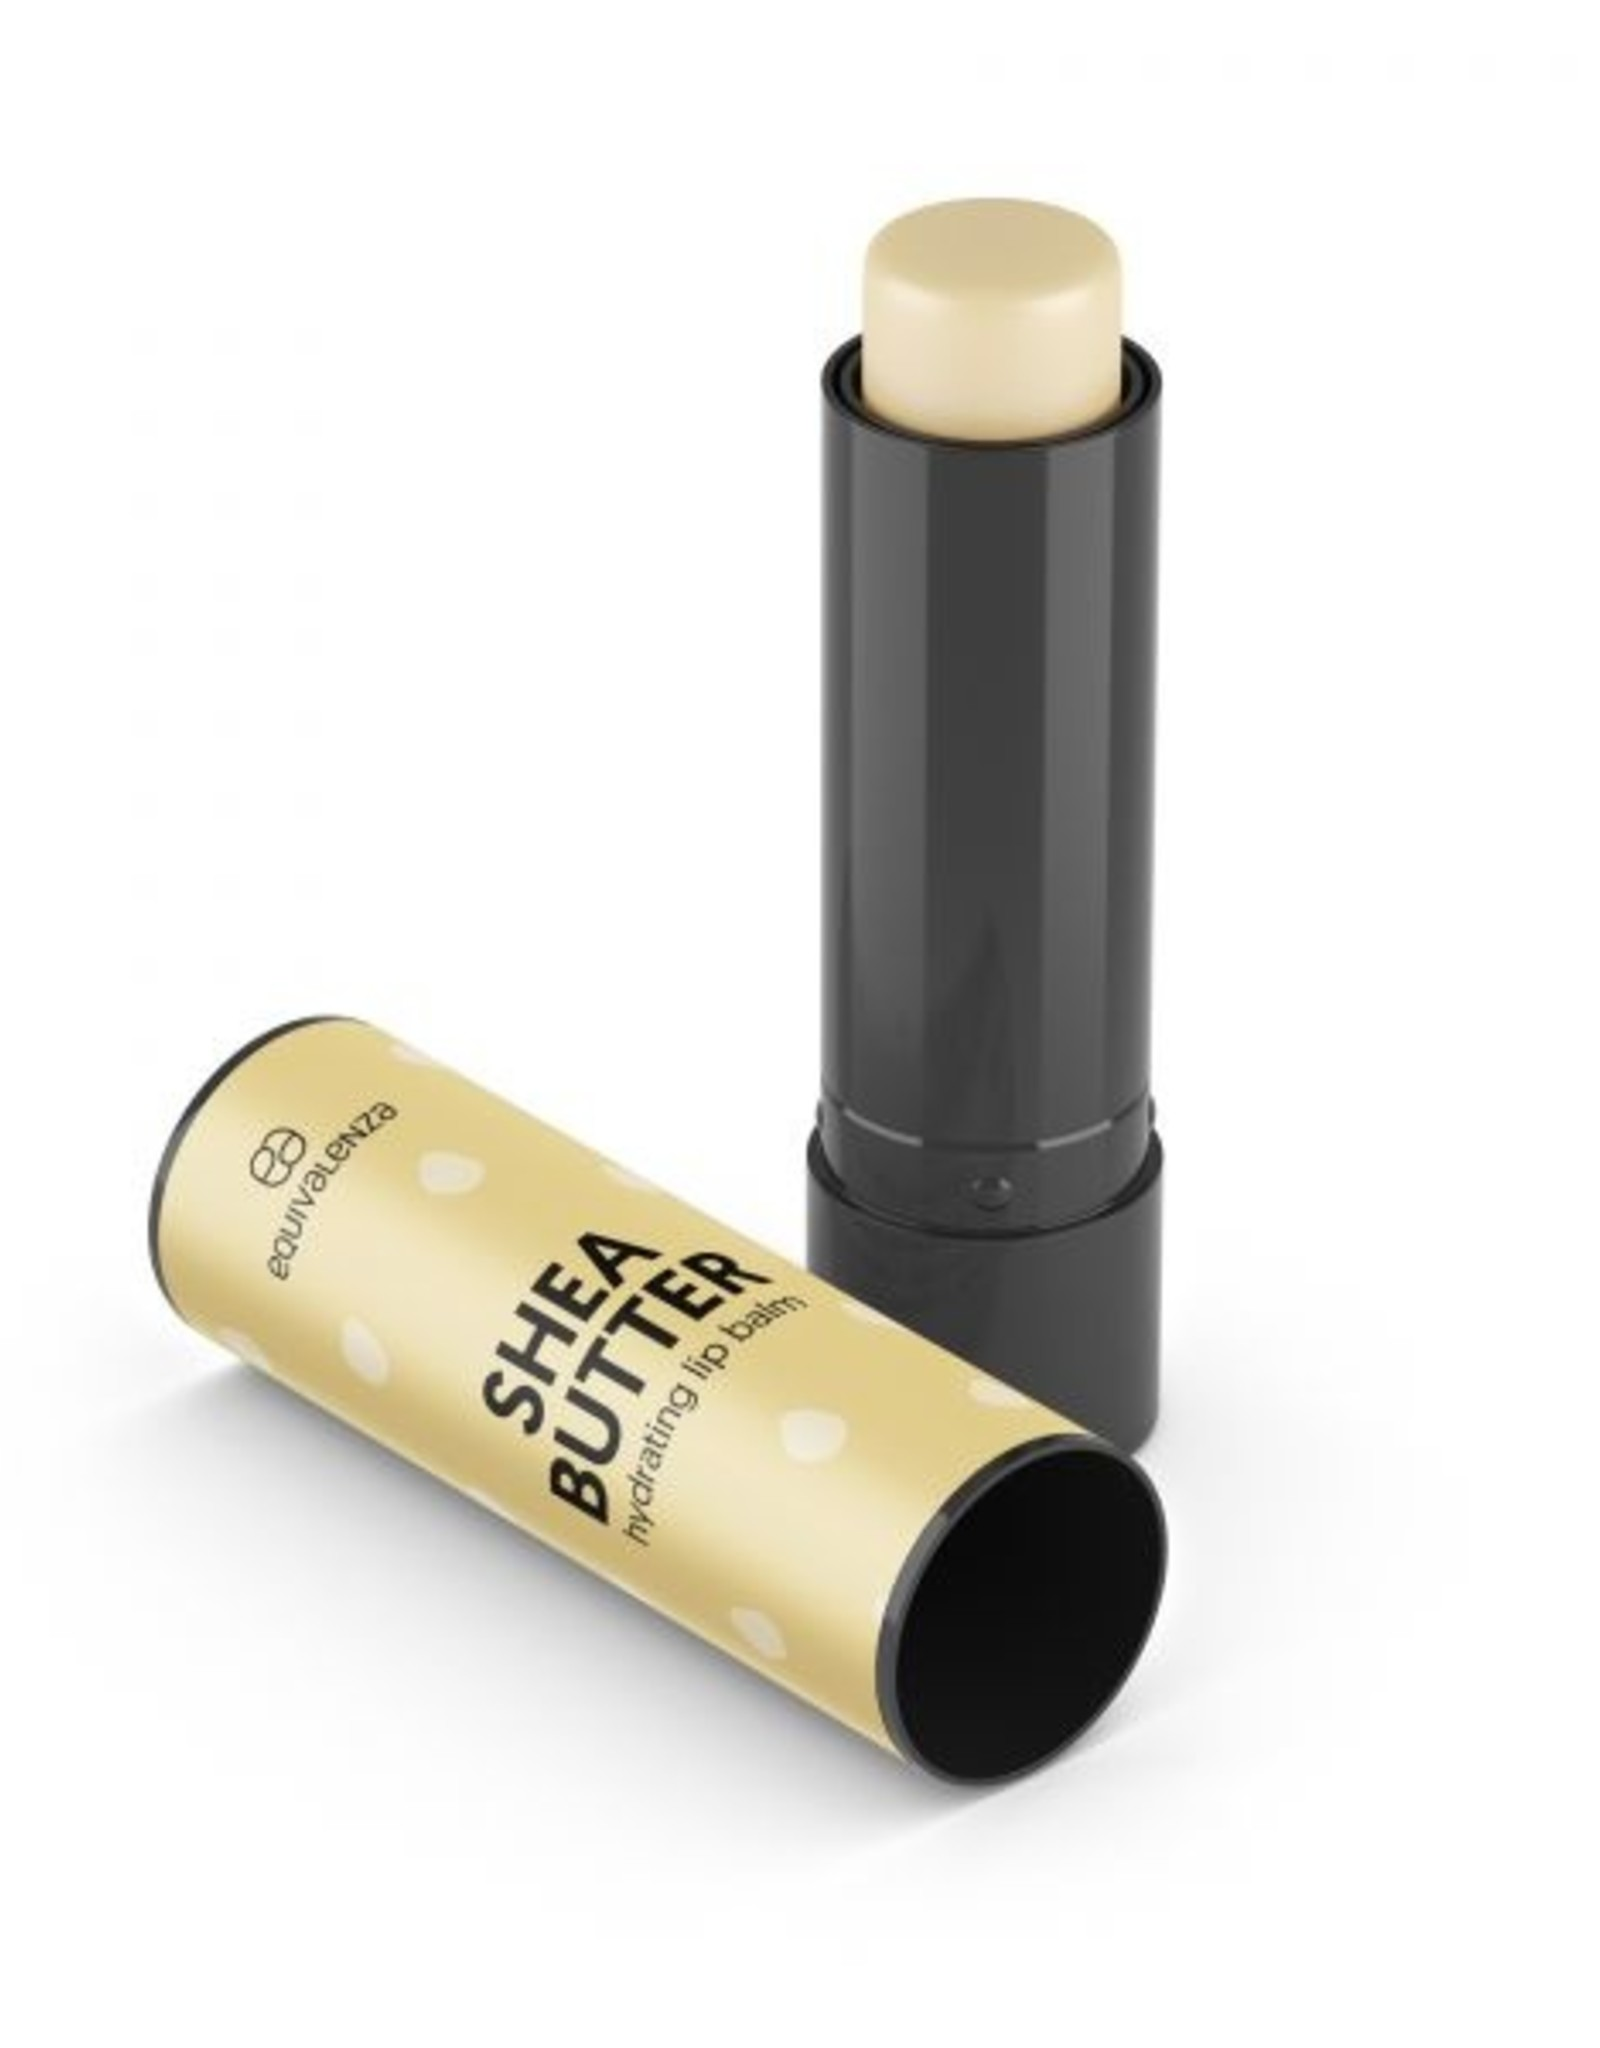 Equivalenza Shea Butter Lip Balm Stick